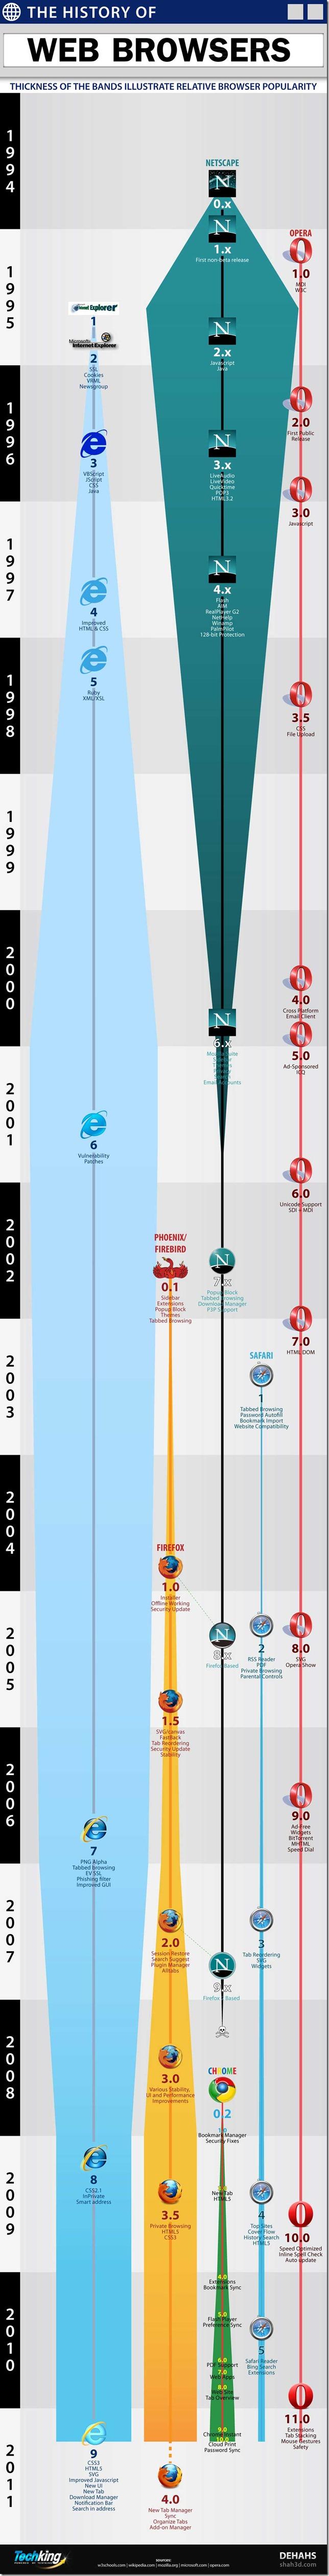 IG-Browser-Evo-2-1000px